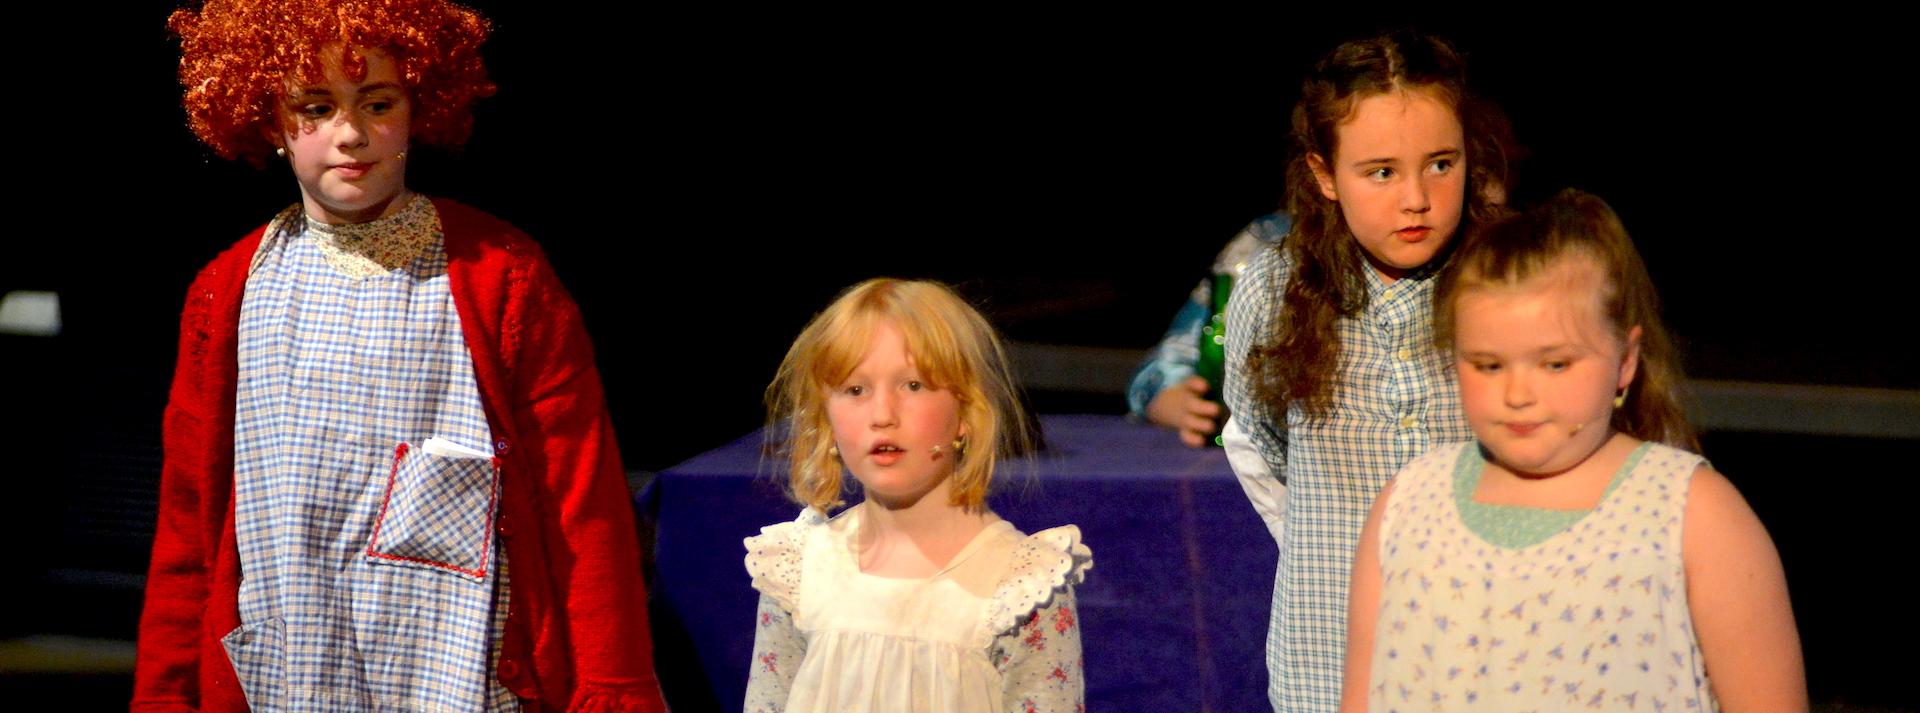 1920x700-showcase-siogenedd-aberdare-wales-youth-theater-performance-confidence-drama-club-annie-2017-031